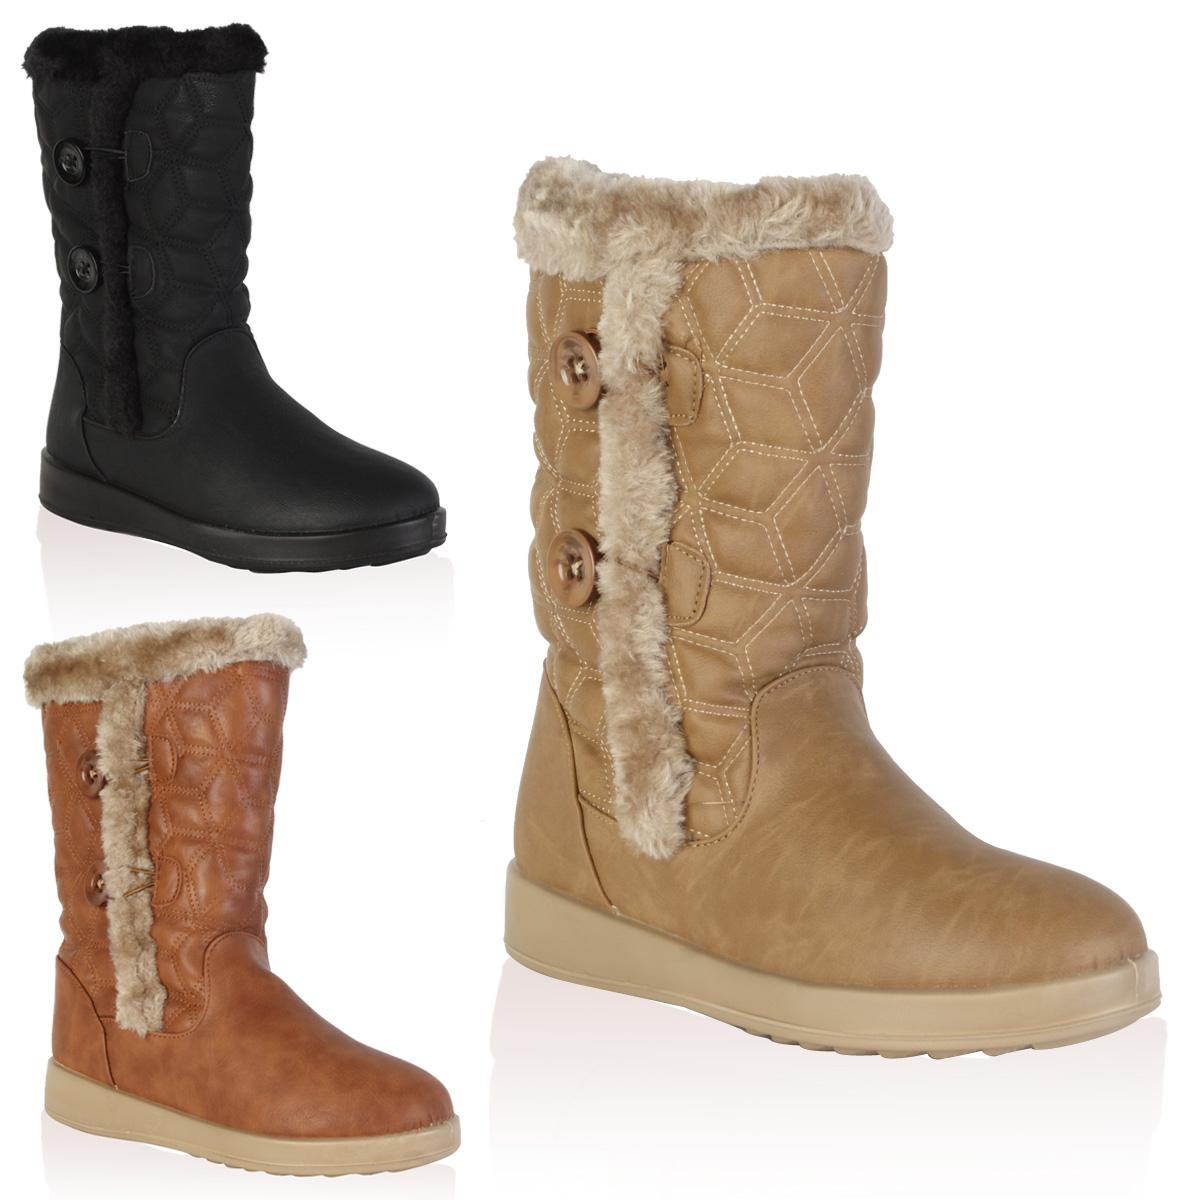 Womens Snow Boots Size 10 | NATIONAL SHERIFFS' ASSOCIATION